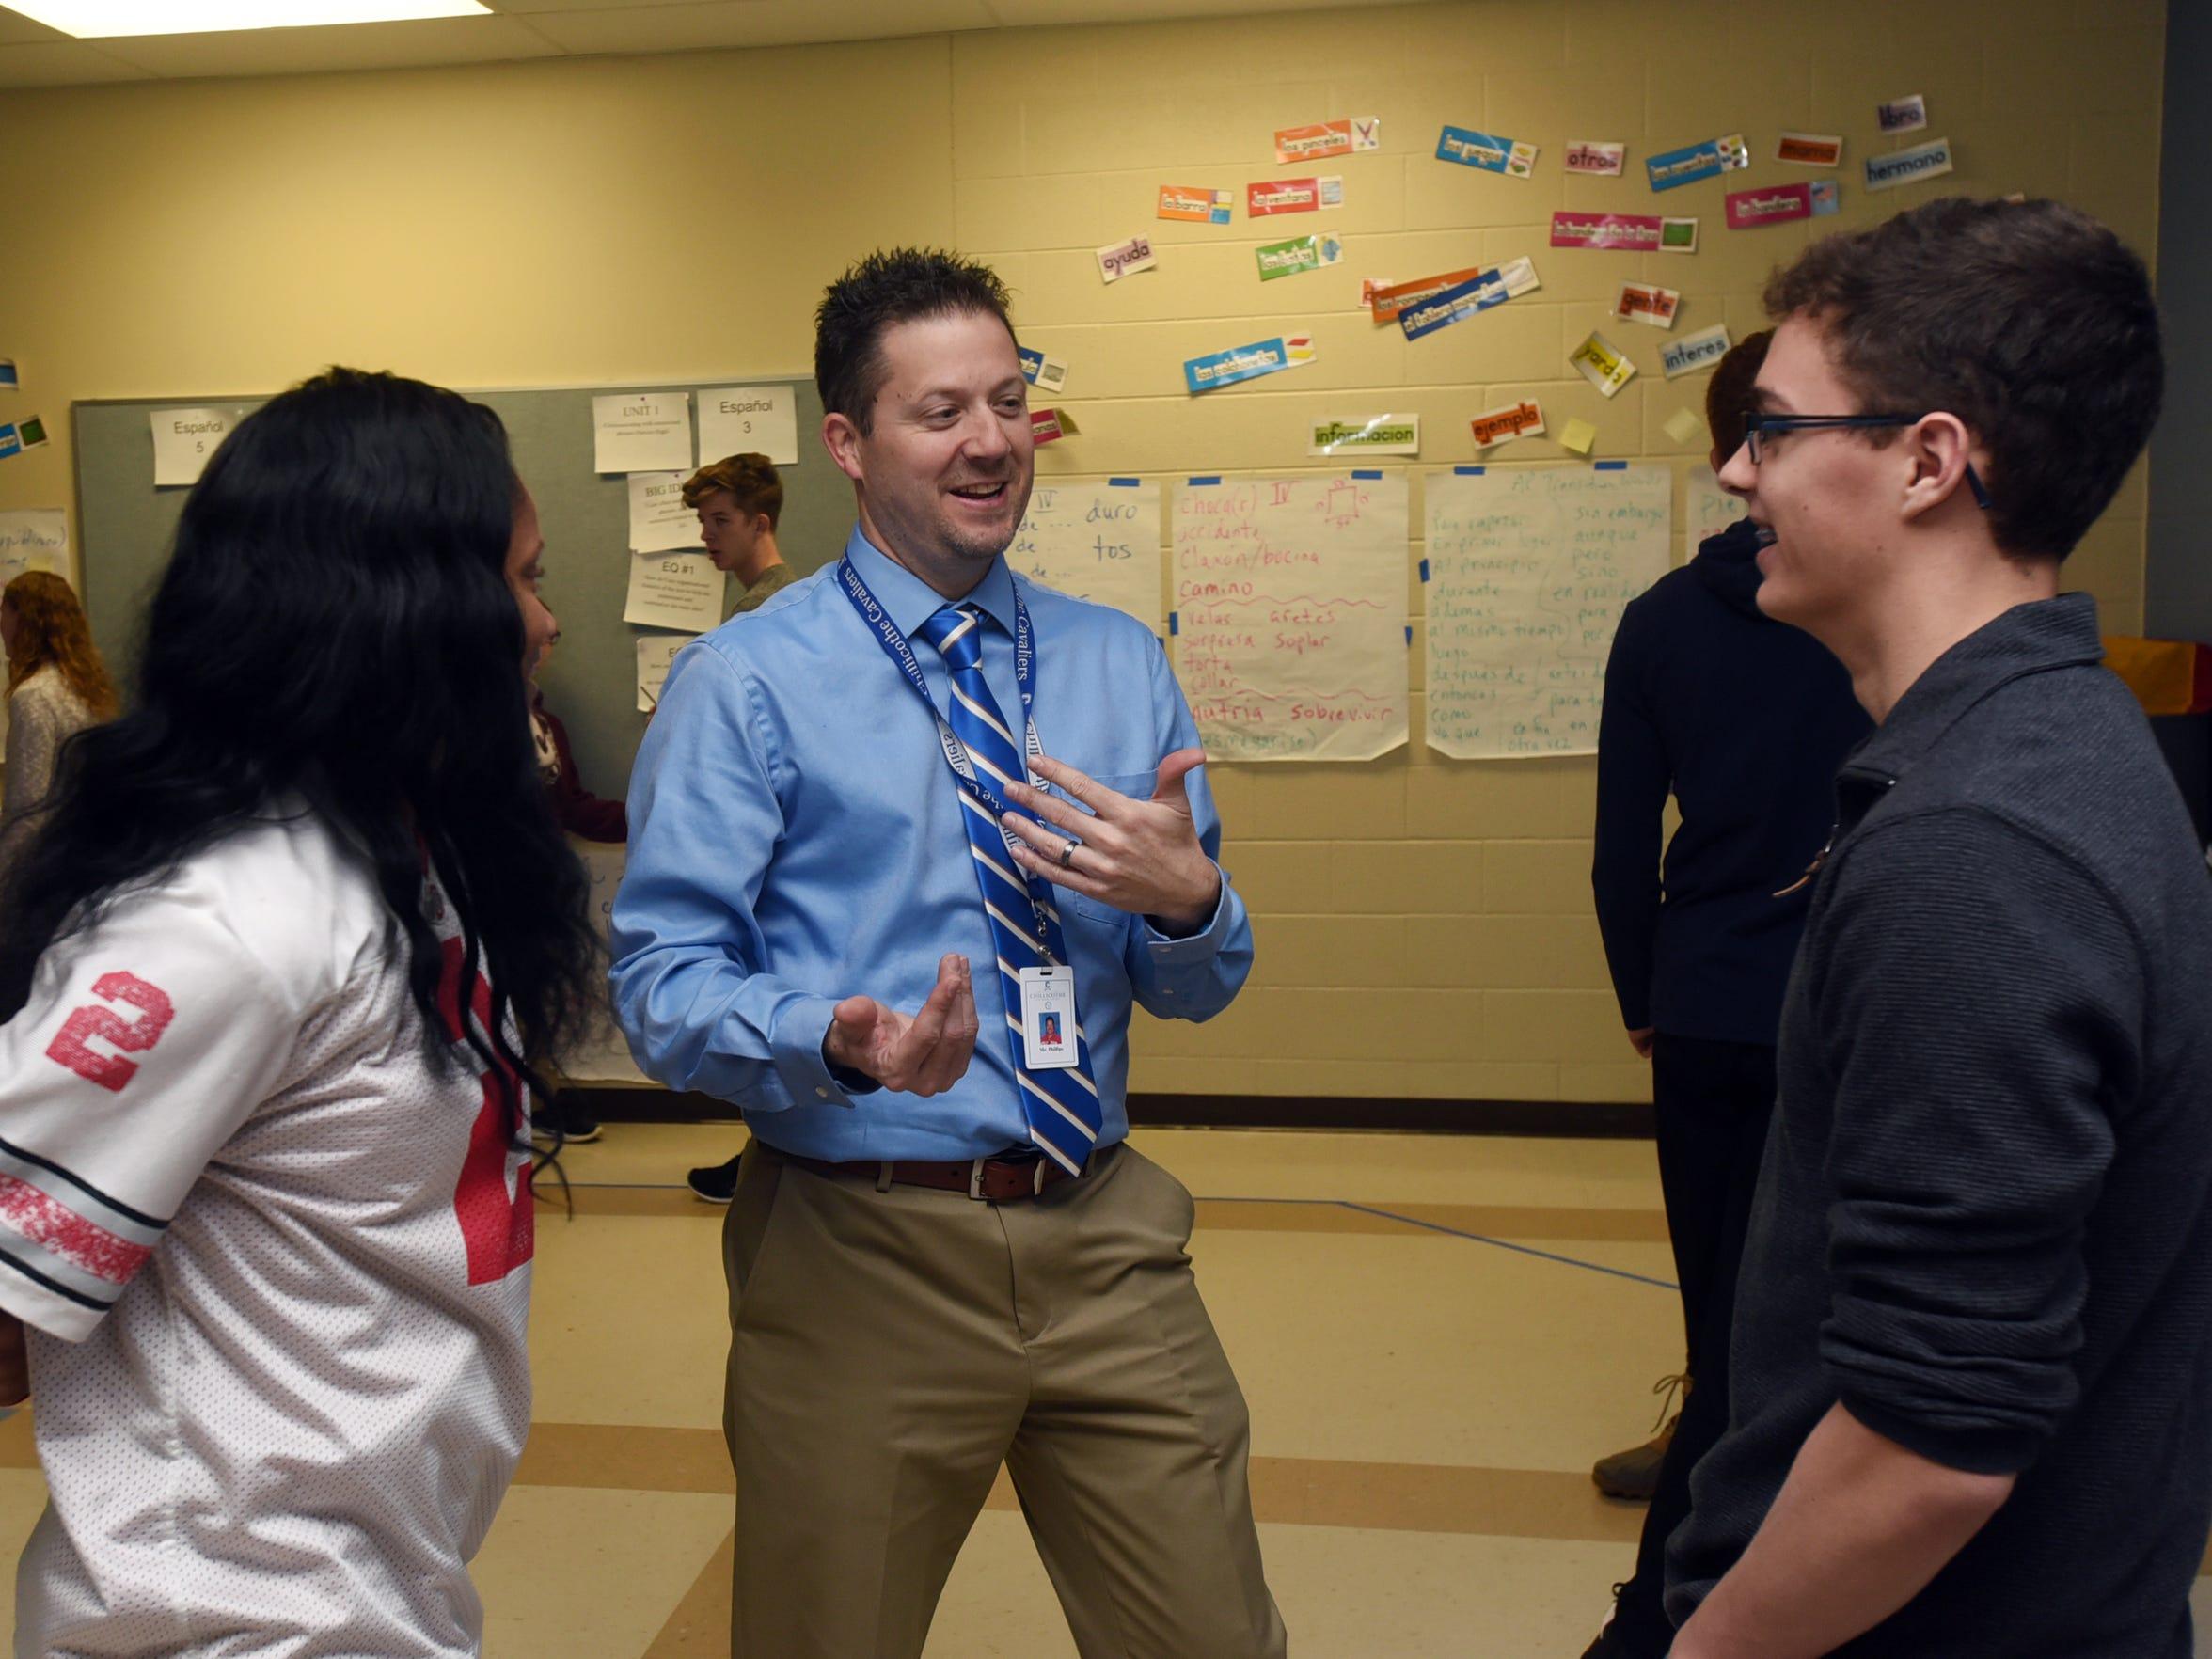 Greg Phillips, center, talks to students in Spanish